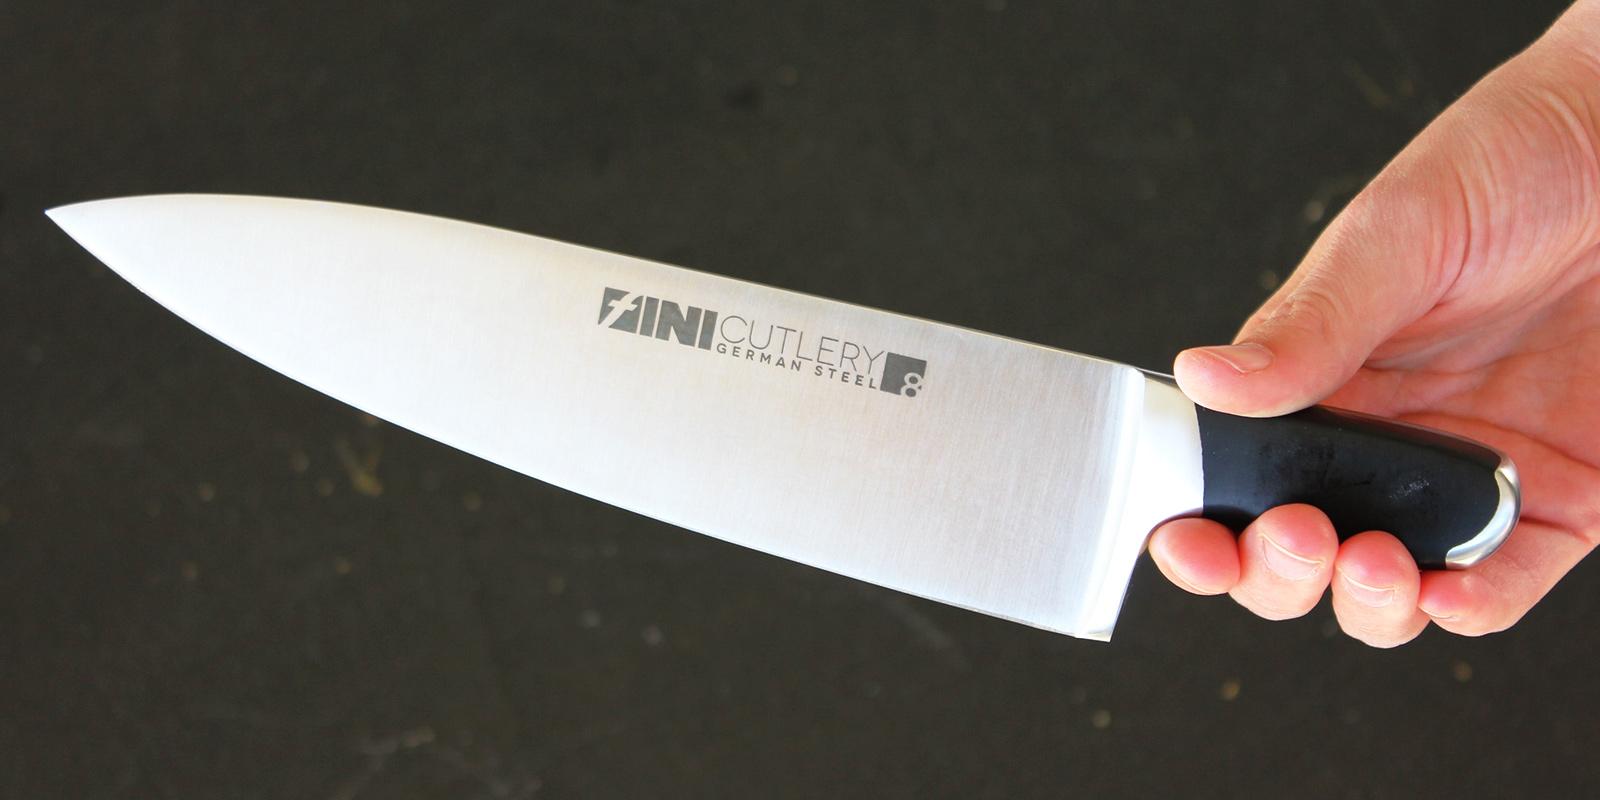 fini-cutlery-chefs-hand